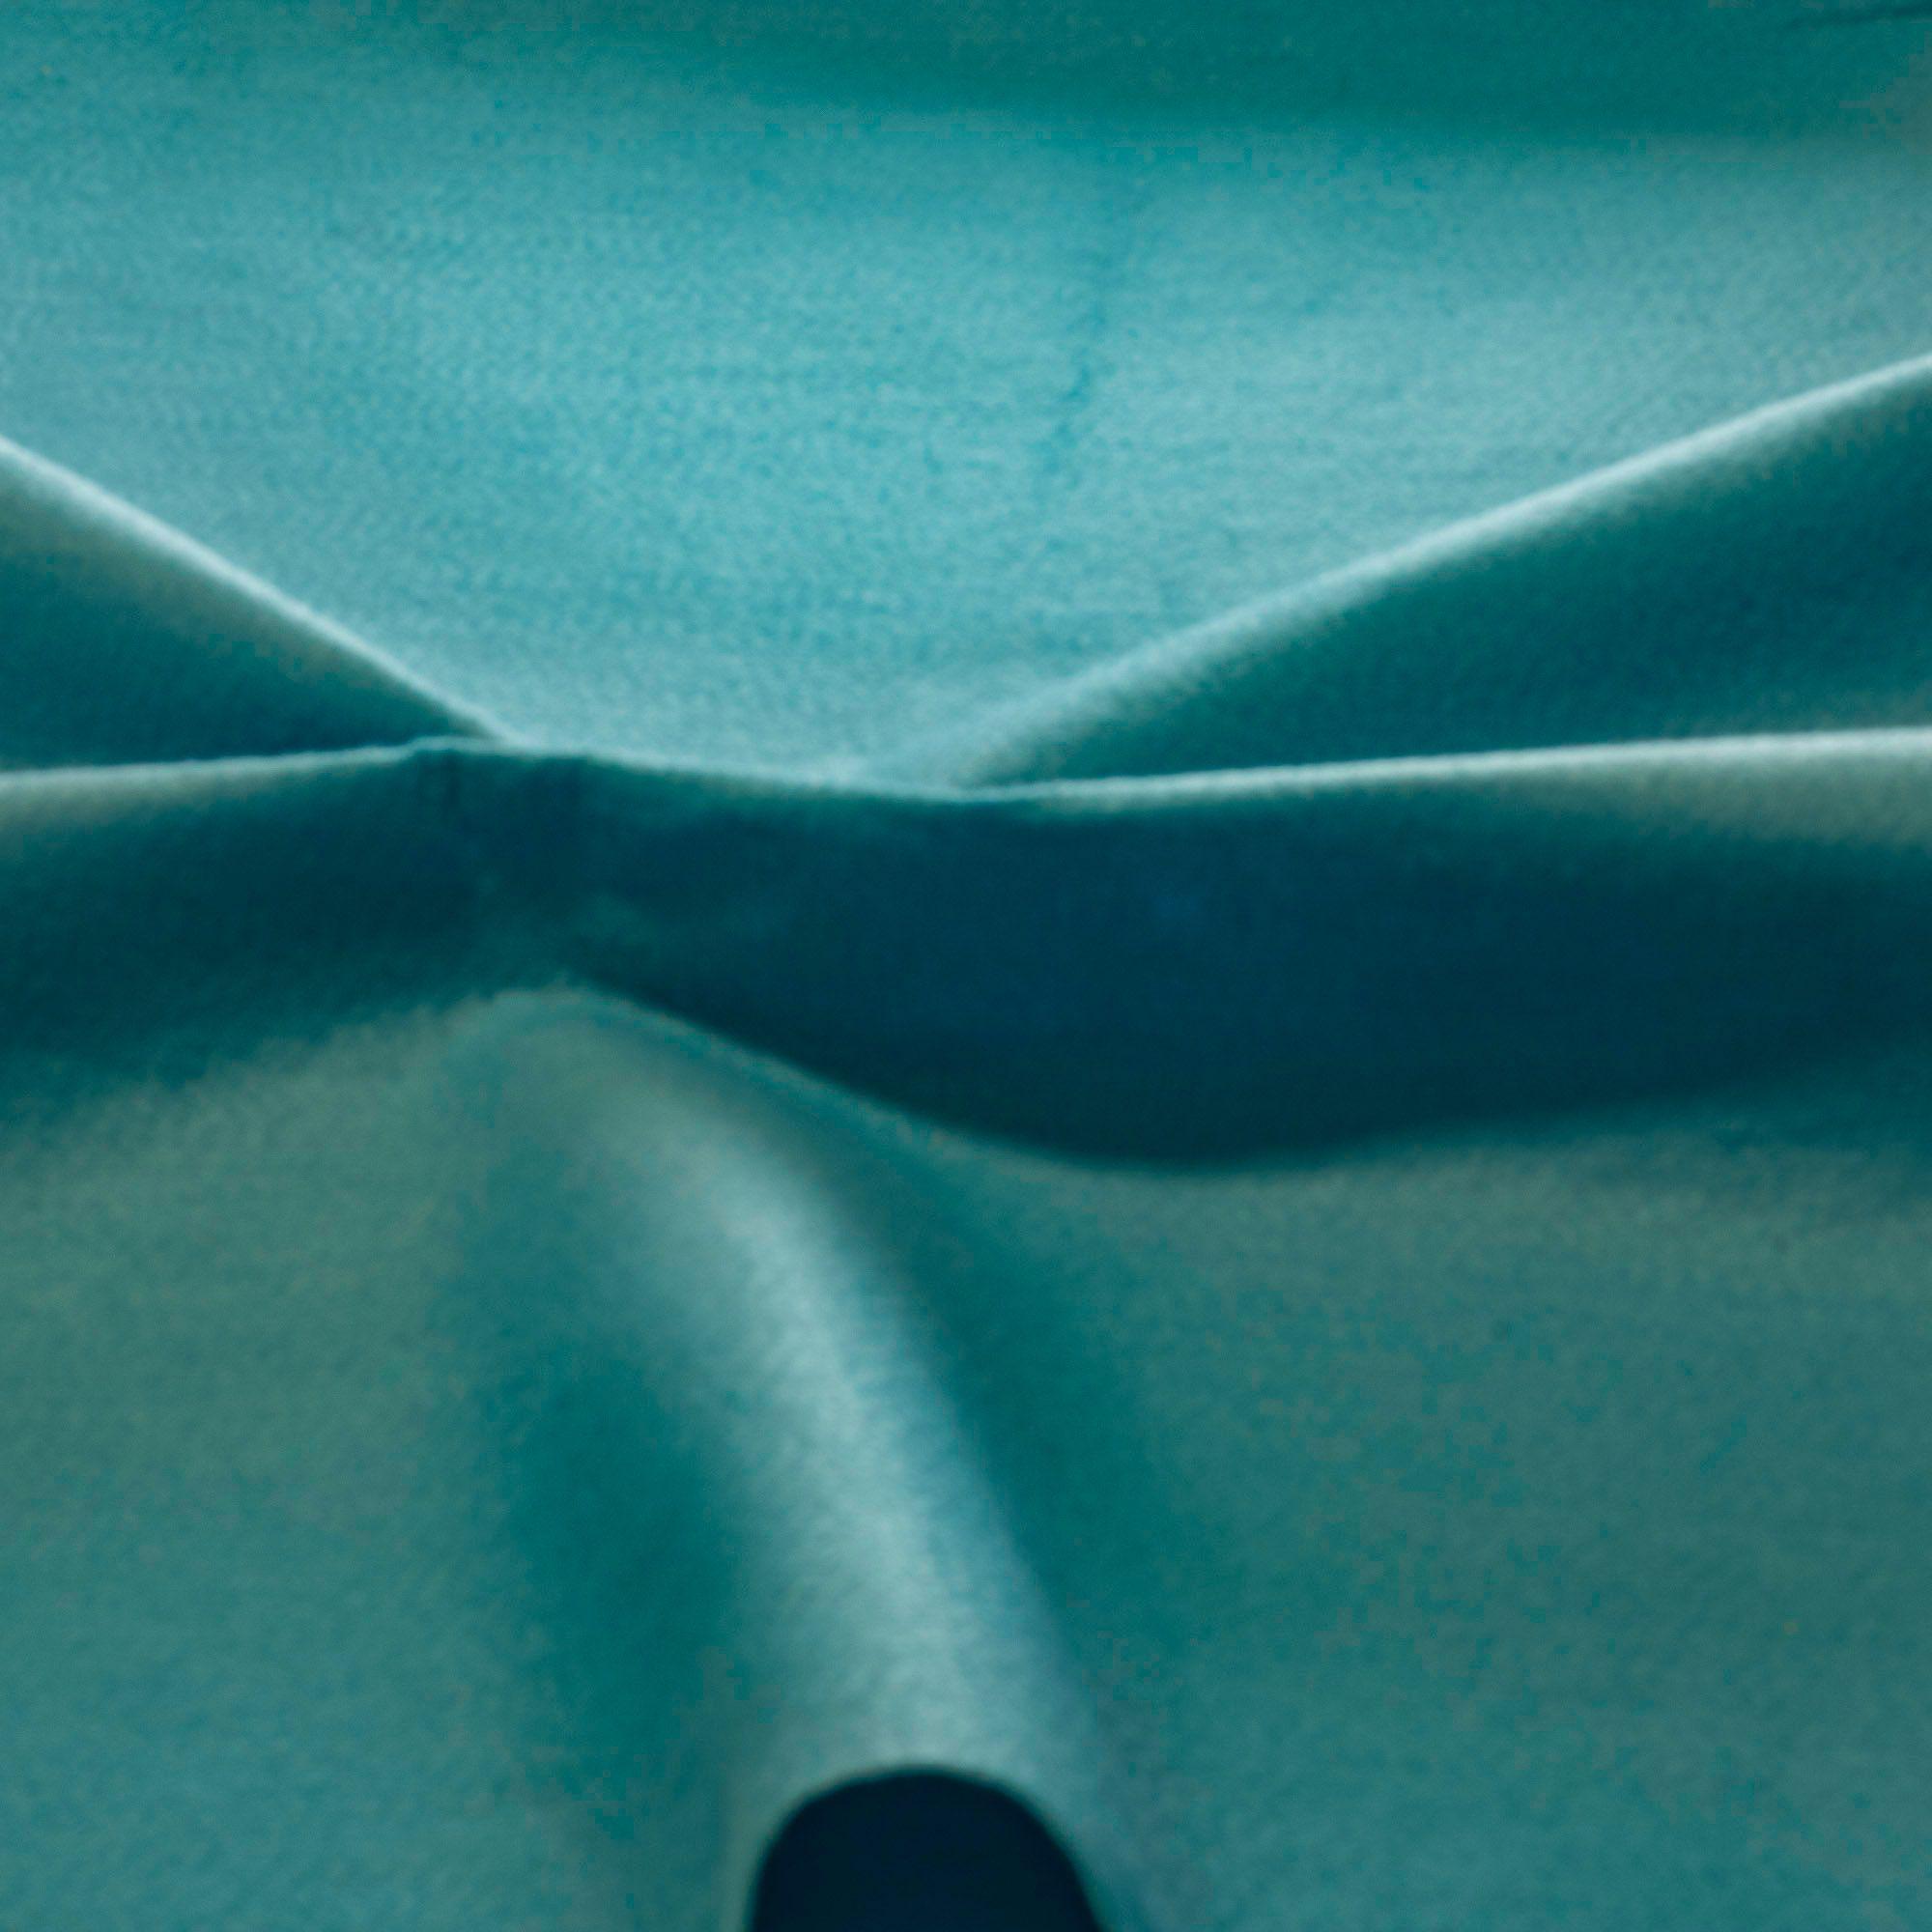 Tecido Feltro Azul Turquesa 100% Poliester 1,40 m Largura